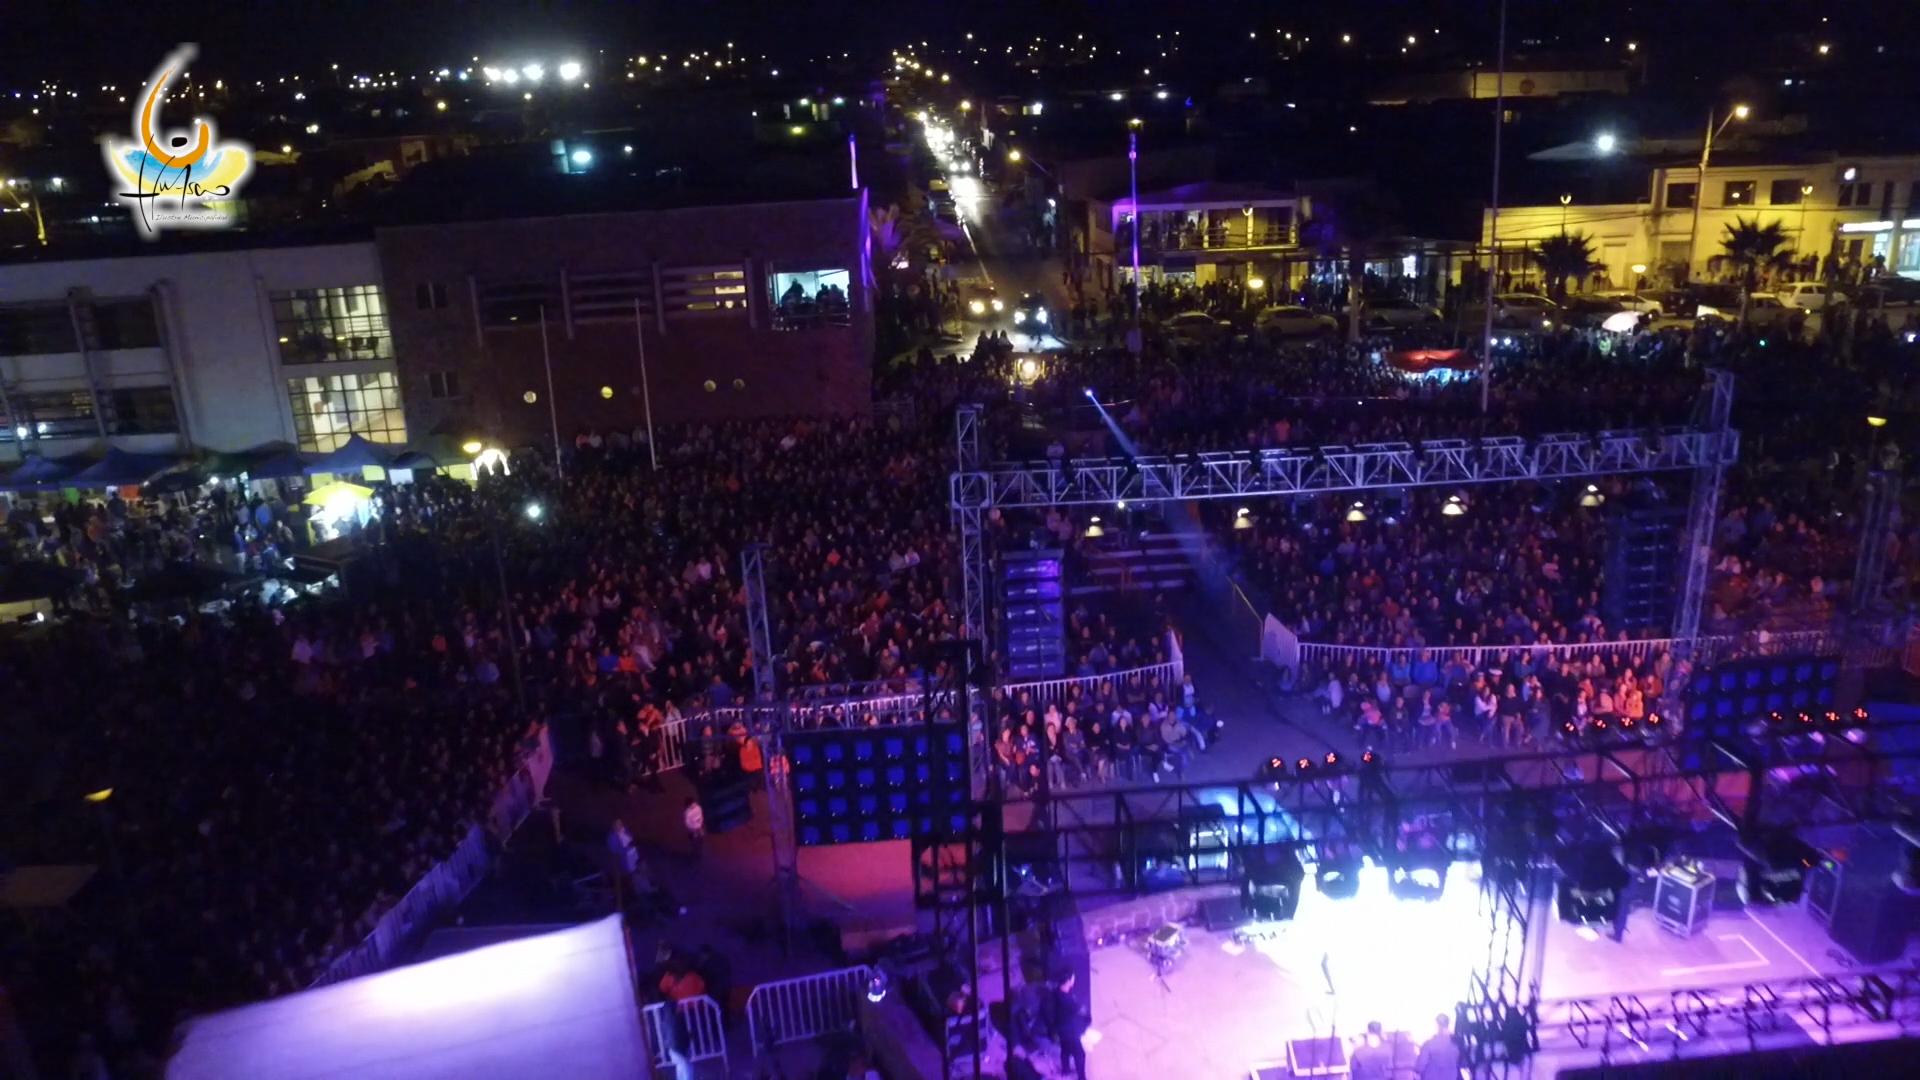 Peligra festival de El Velero en Huasco ante polémica de concejal de RN